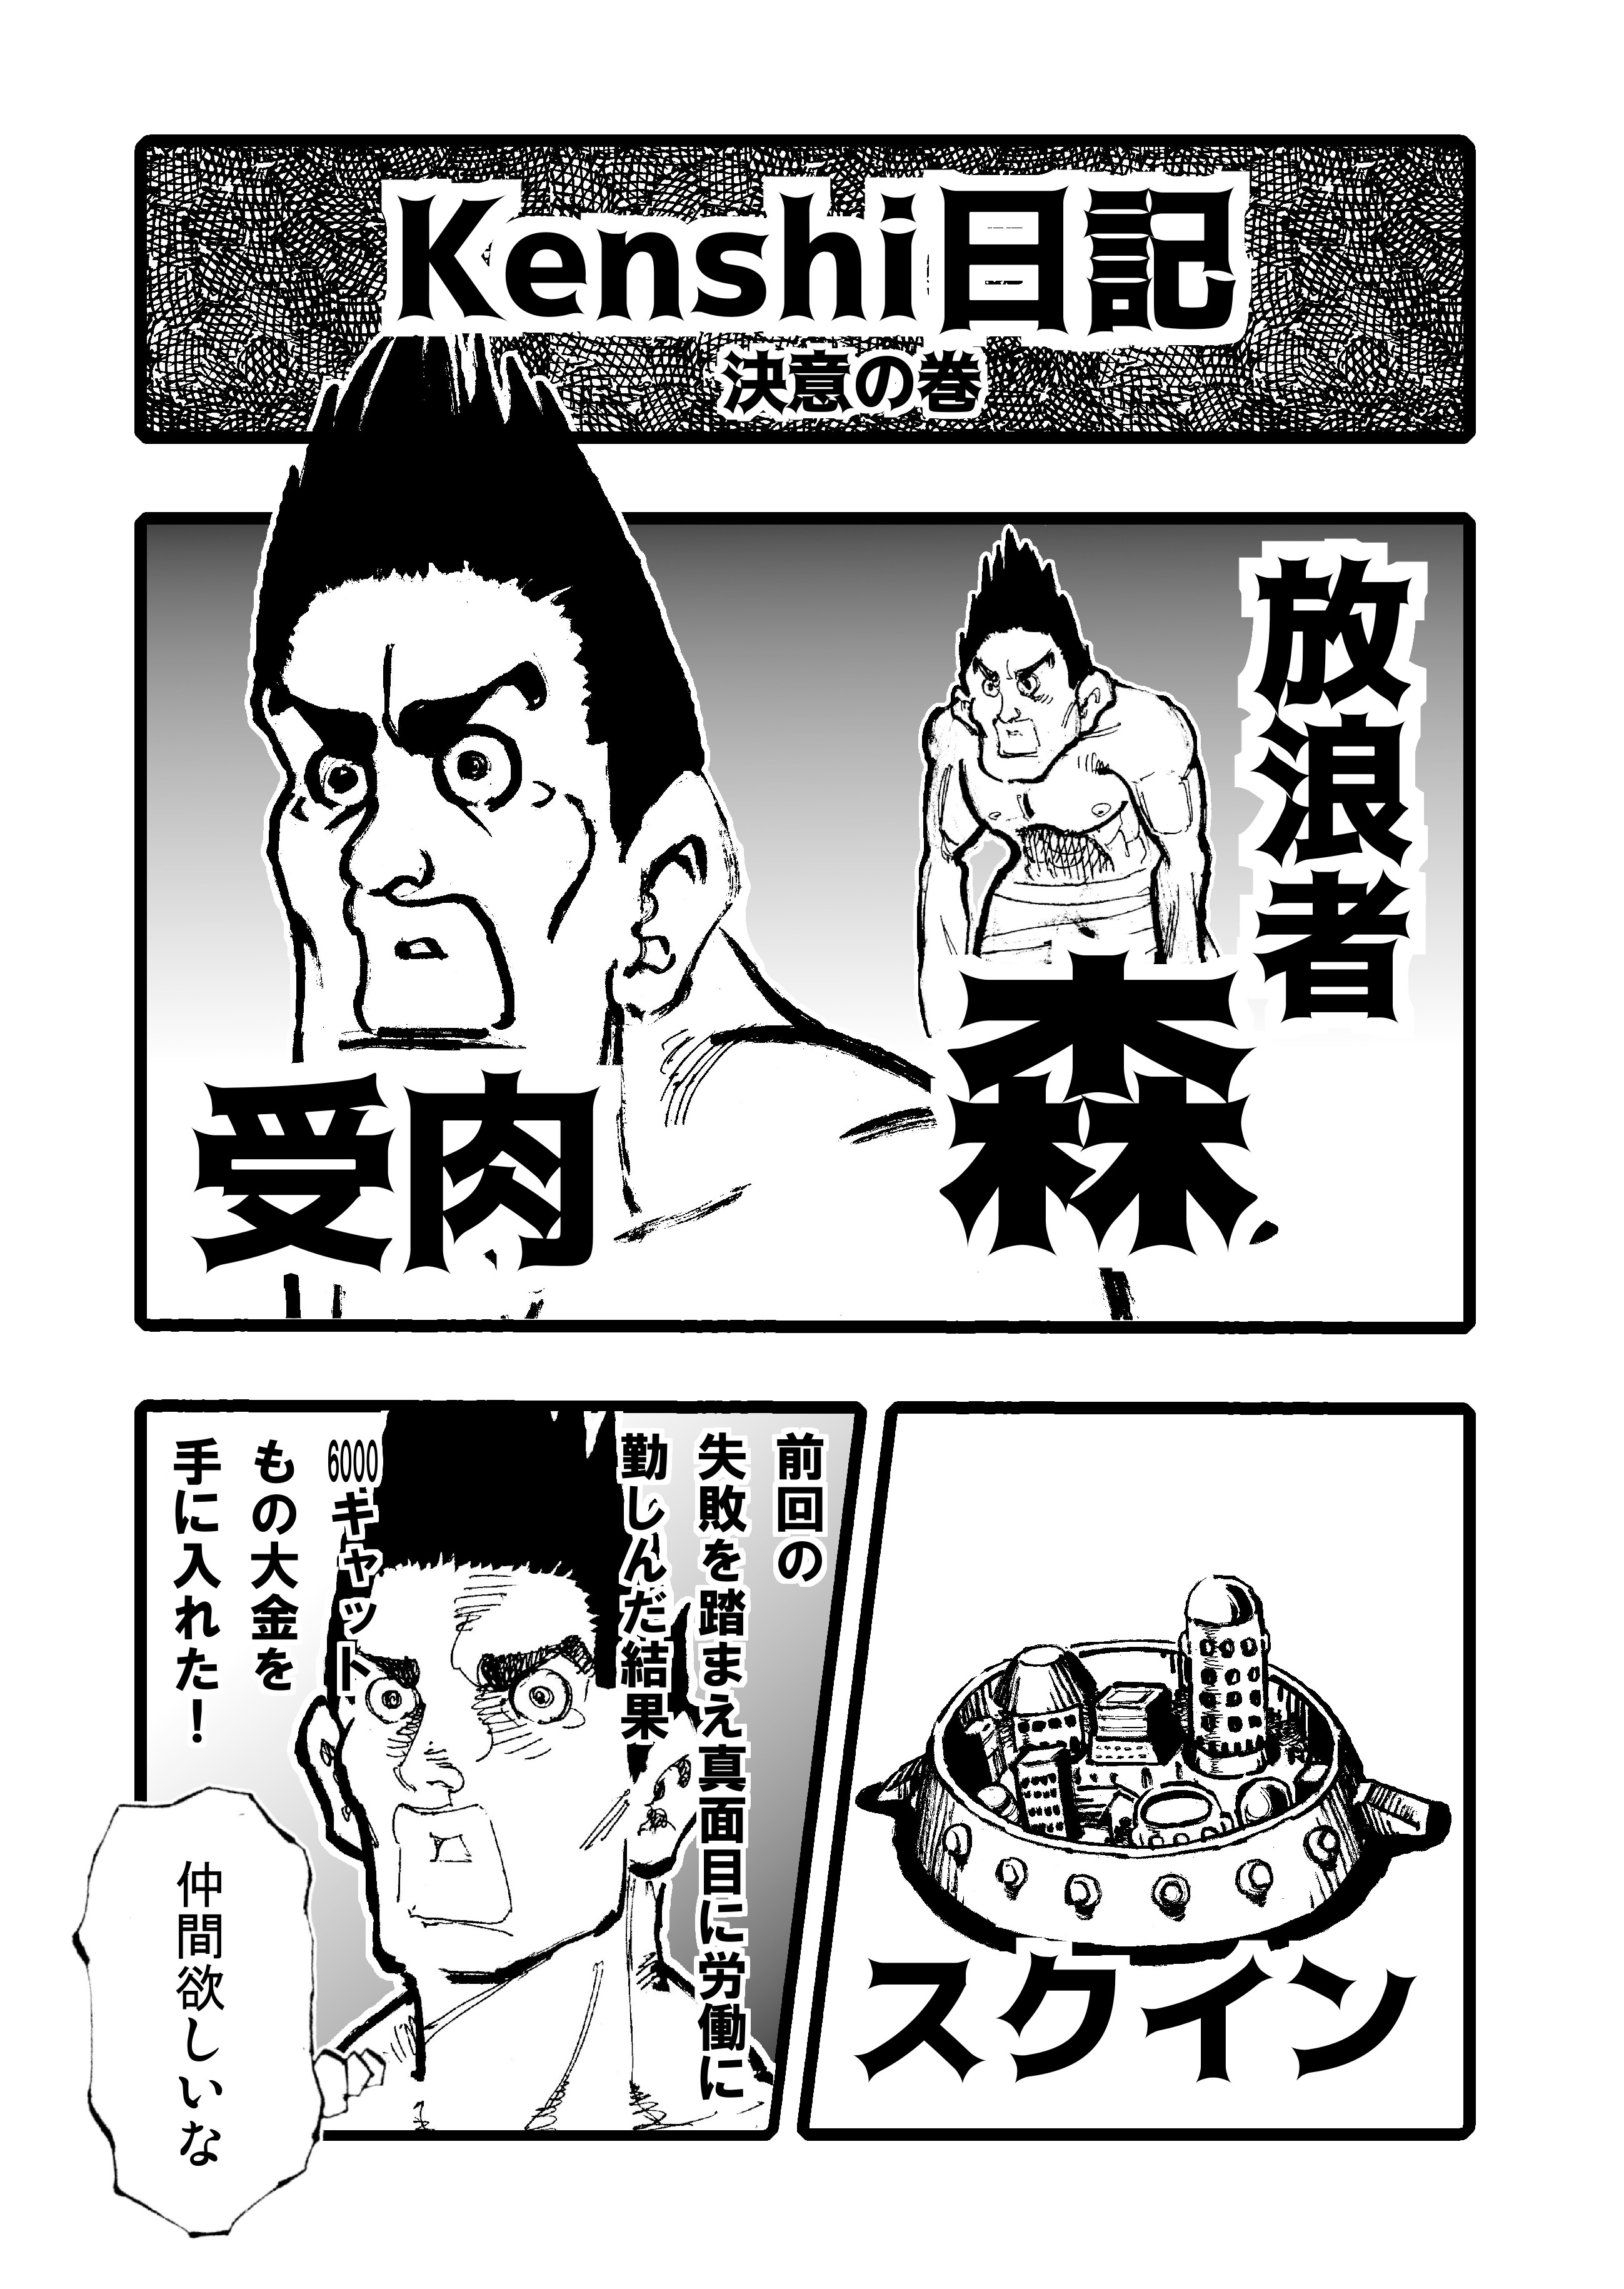 Kenshi日記2 決意の巻